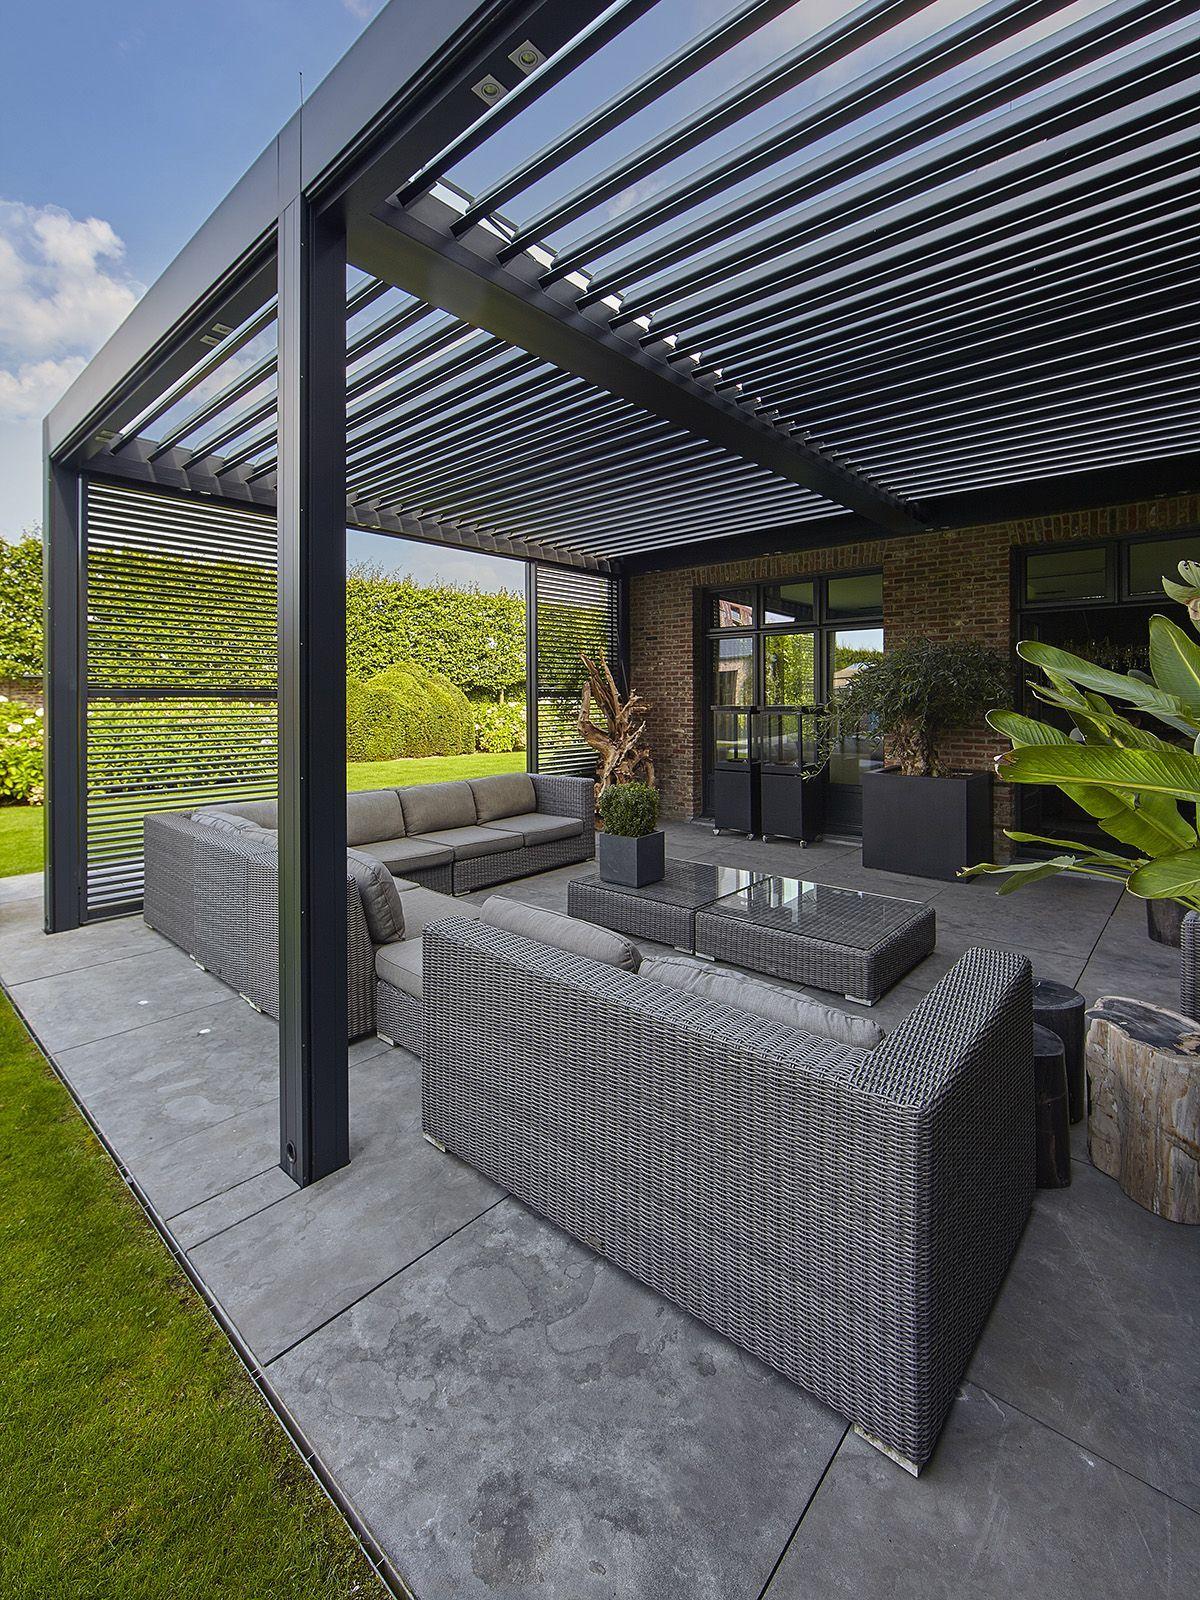 Romantic garden, Ludo Dierckx, Swimming pool, Pool house, Openness …